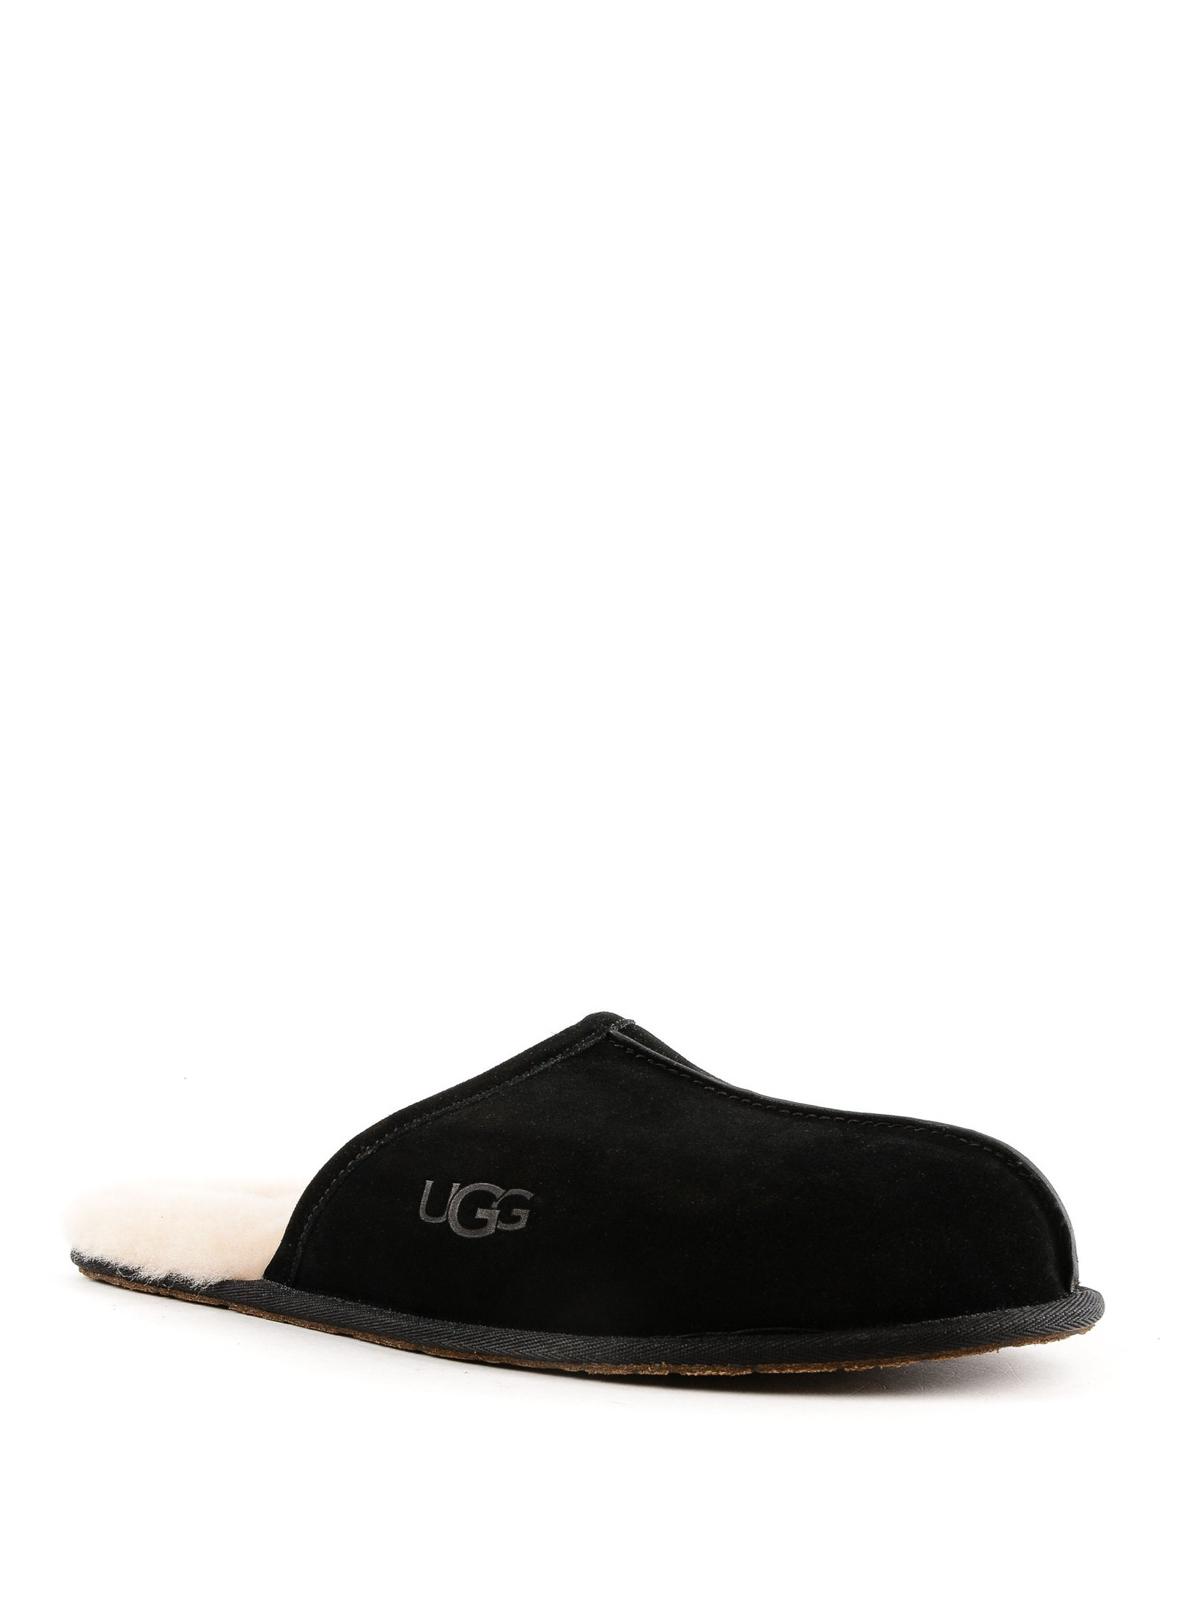 bb576f512f9 Ugg - Scuff suede slippers - Loafers & Slippers - 1101111SCUFFBLK